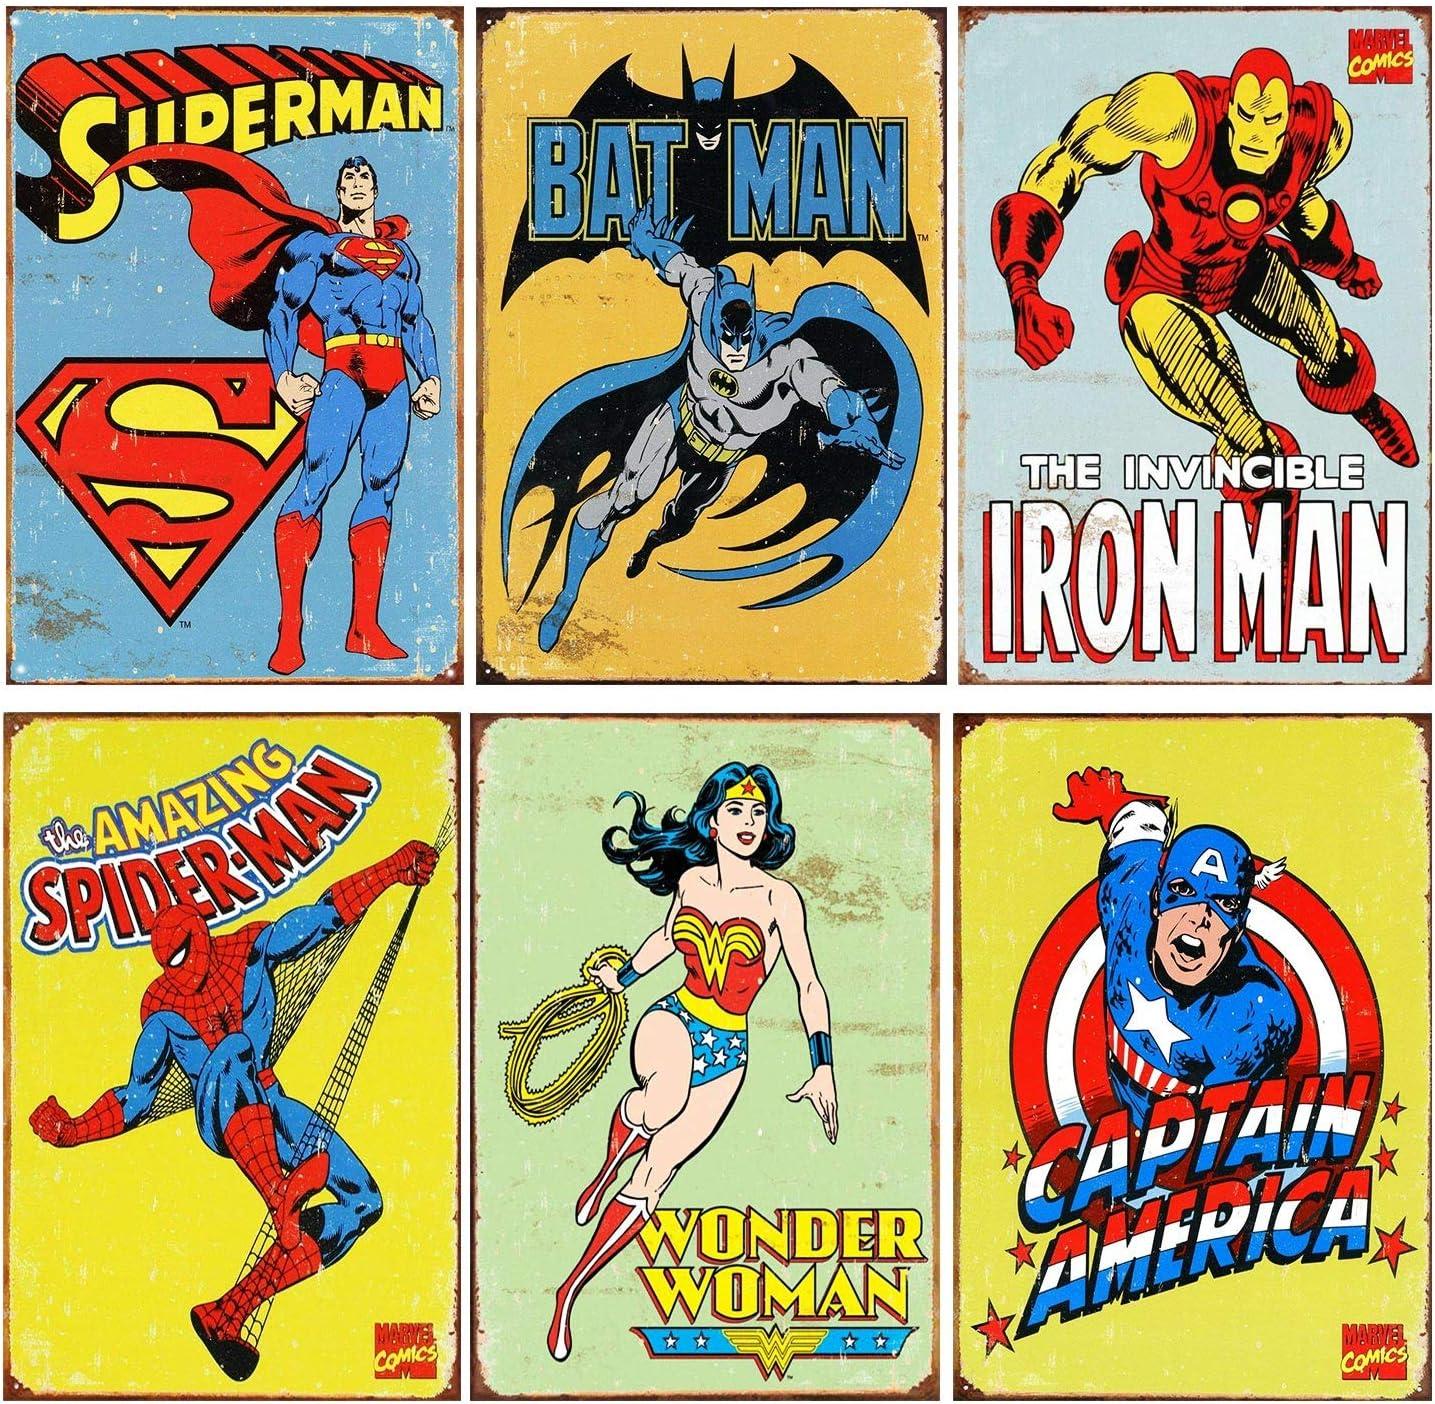 THE LAST SUPPER HULK WONDER WOMAN SPIDERMAN IRON MAN SUPERMAN PUBLICITY PHOTO